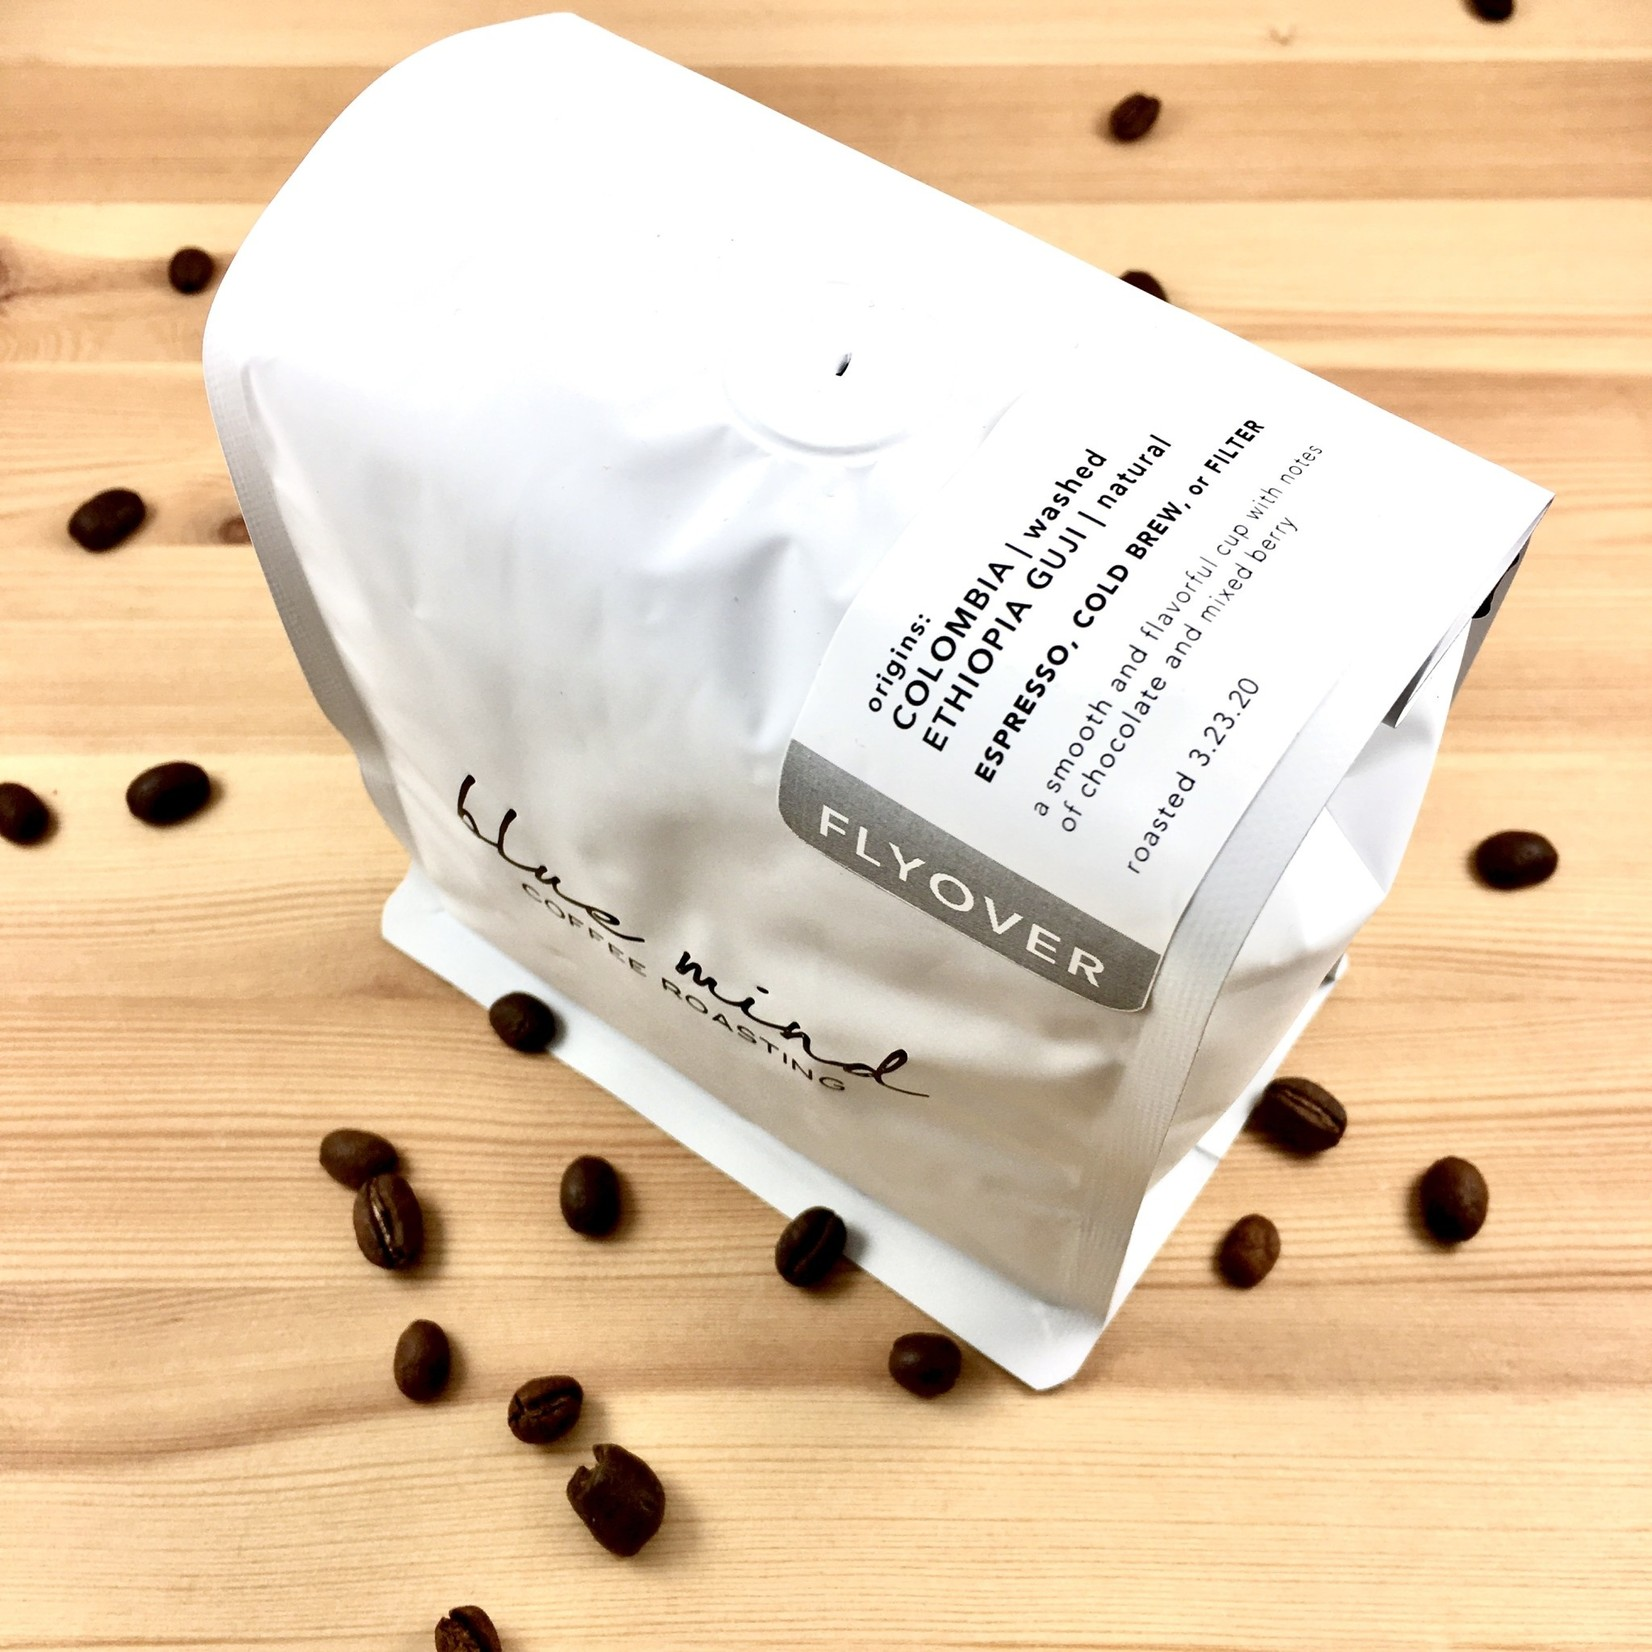 Blue Mind Roasting Blue Mind: Whole Bean Coffee 12oz. Bags